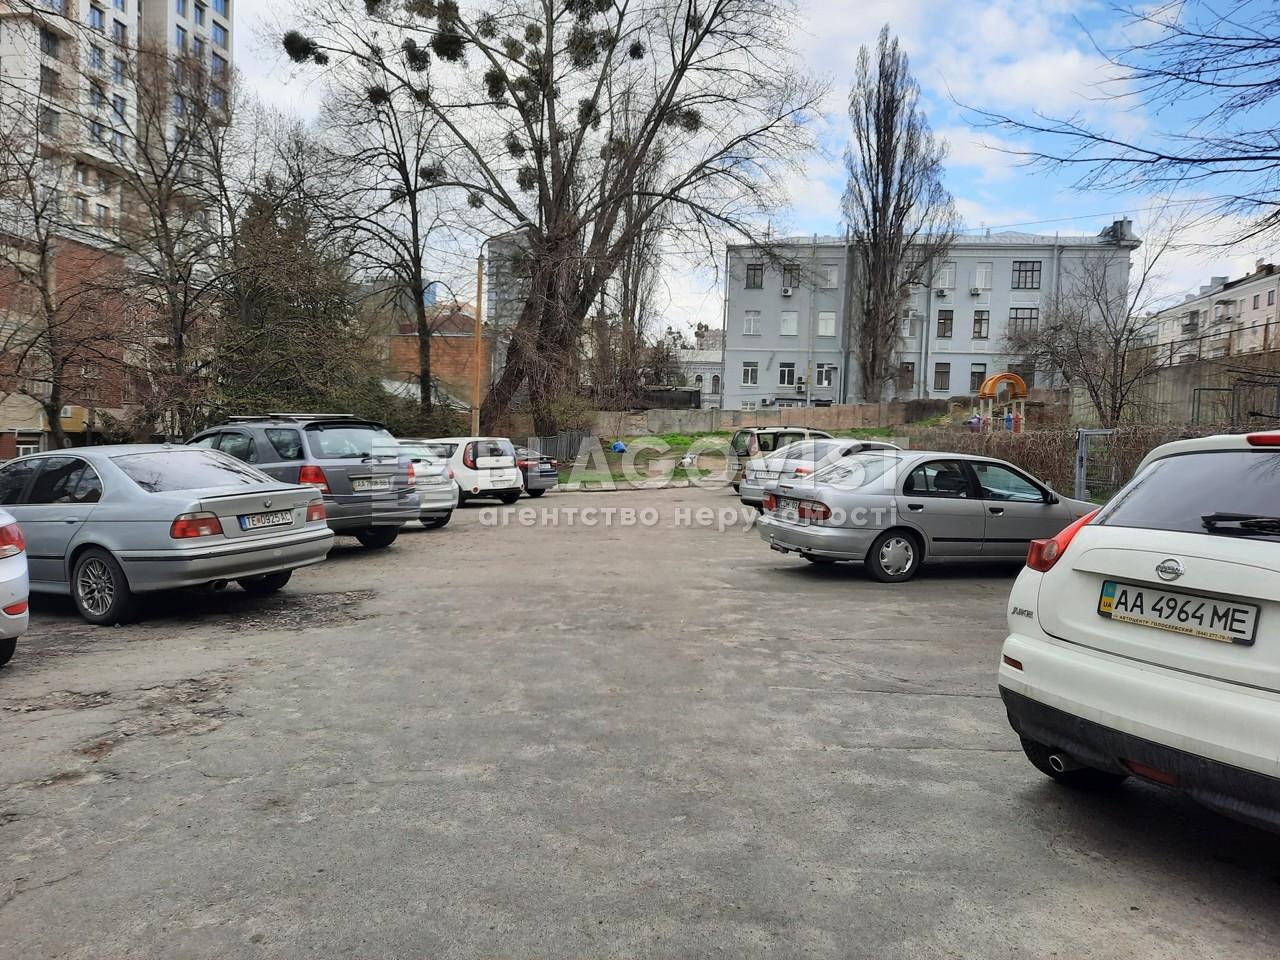 Квартира P-28706, Саксаганского, 69, Киев - Фото 35